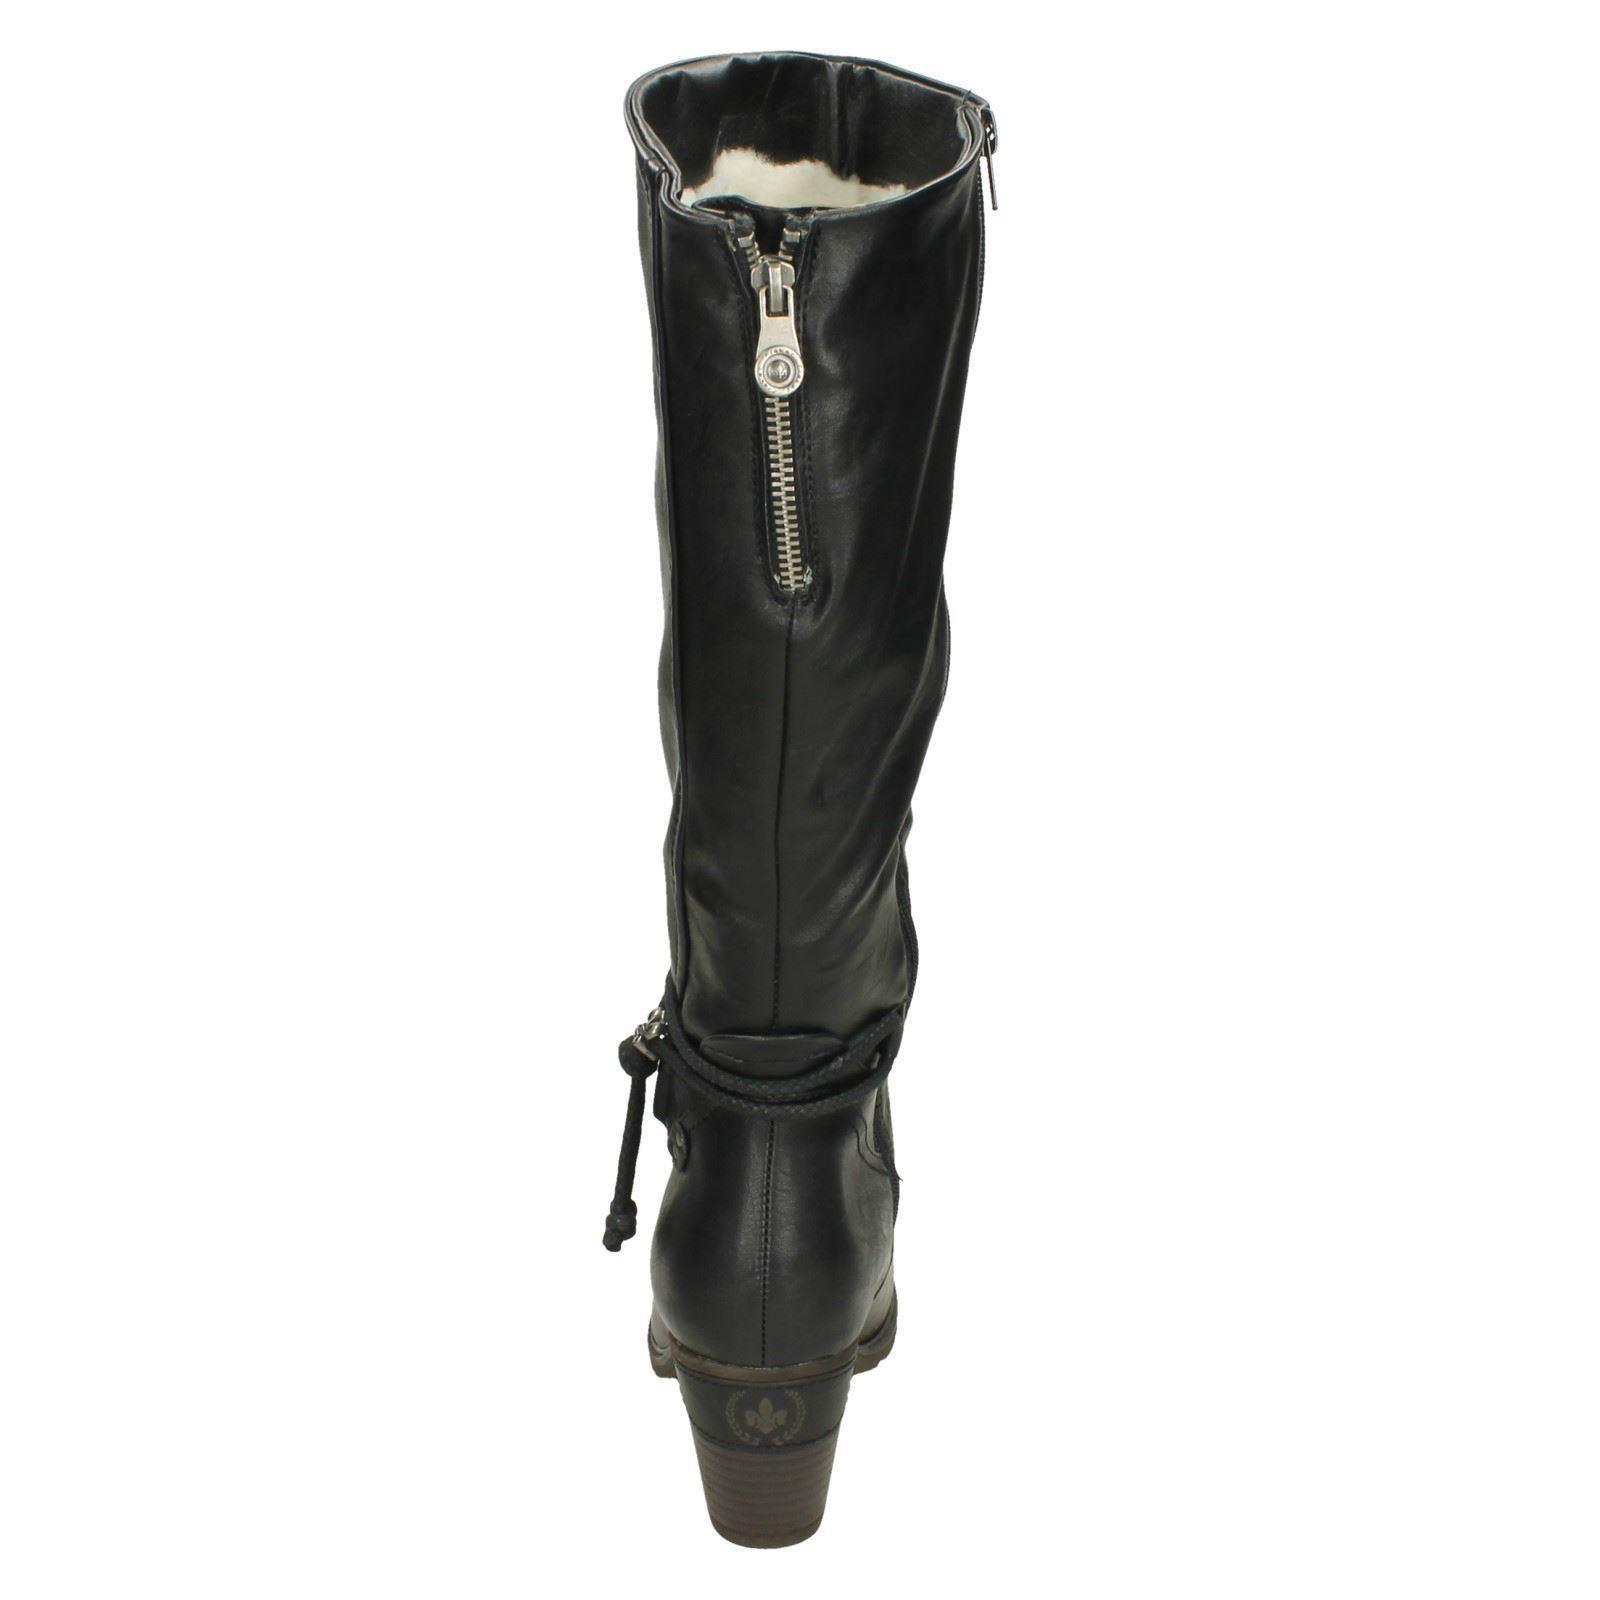 Mujeres Rieker la altas' rodilla botas altas' la 96059' 7fcd92